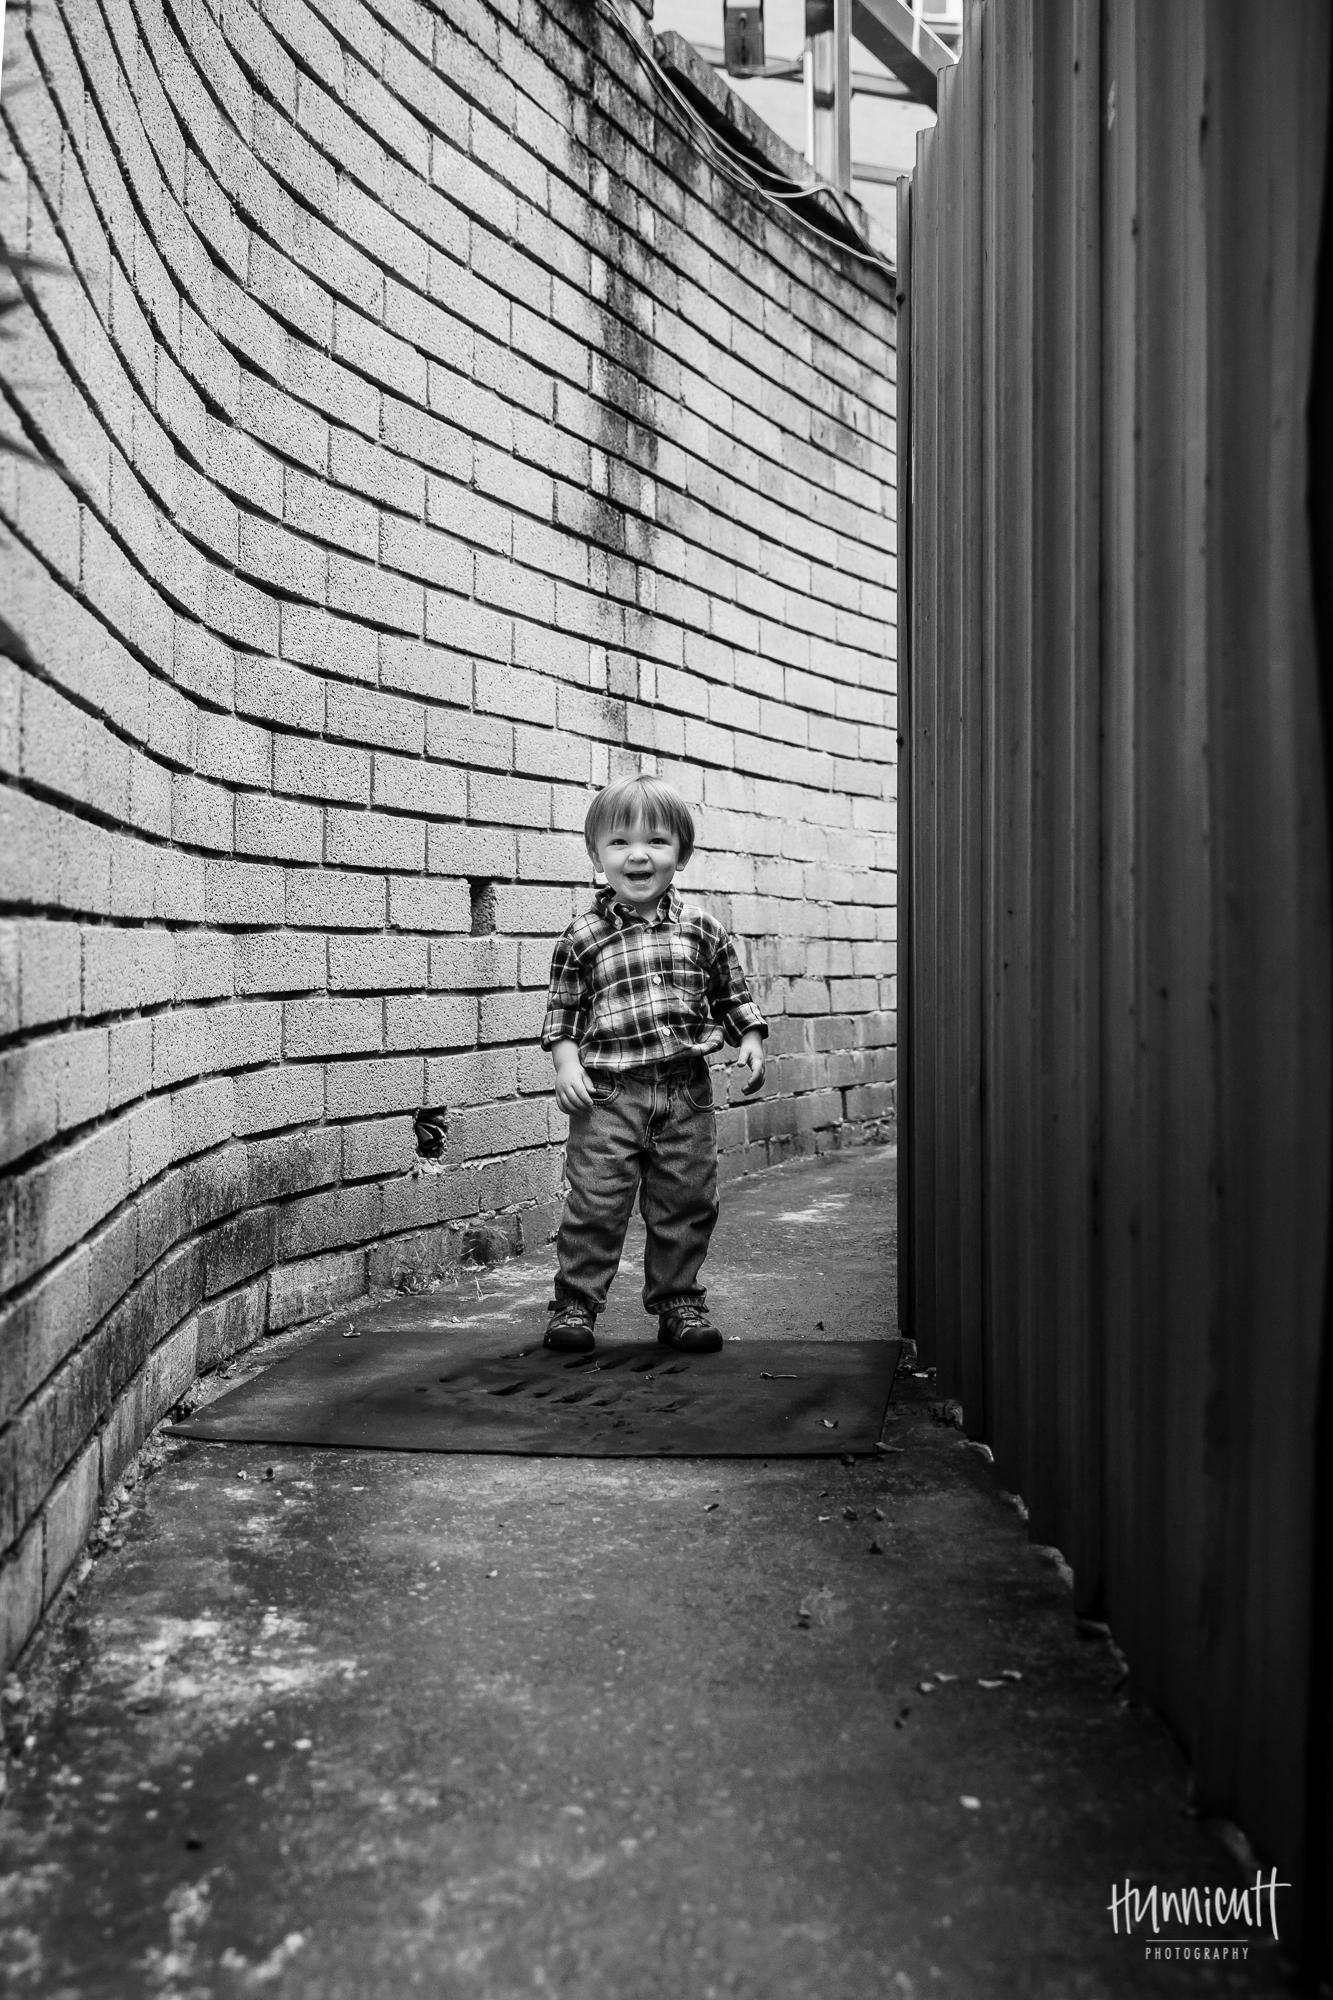 Outdoor-Modern-Urban-Family-Hunnicutt-Photography-Rebecca-Hunnicutt-Farren-Taichung-Taiwan-Exploring-Neighborhood-3